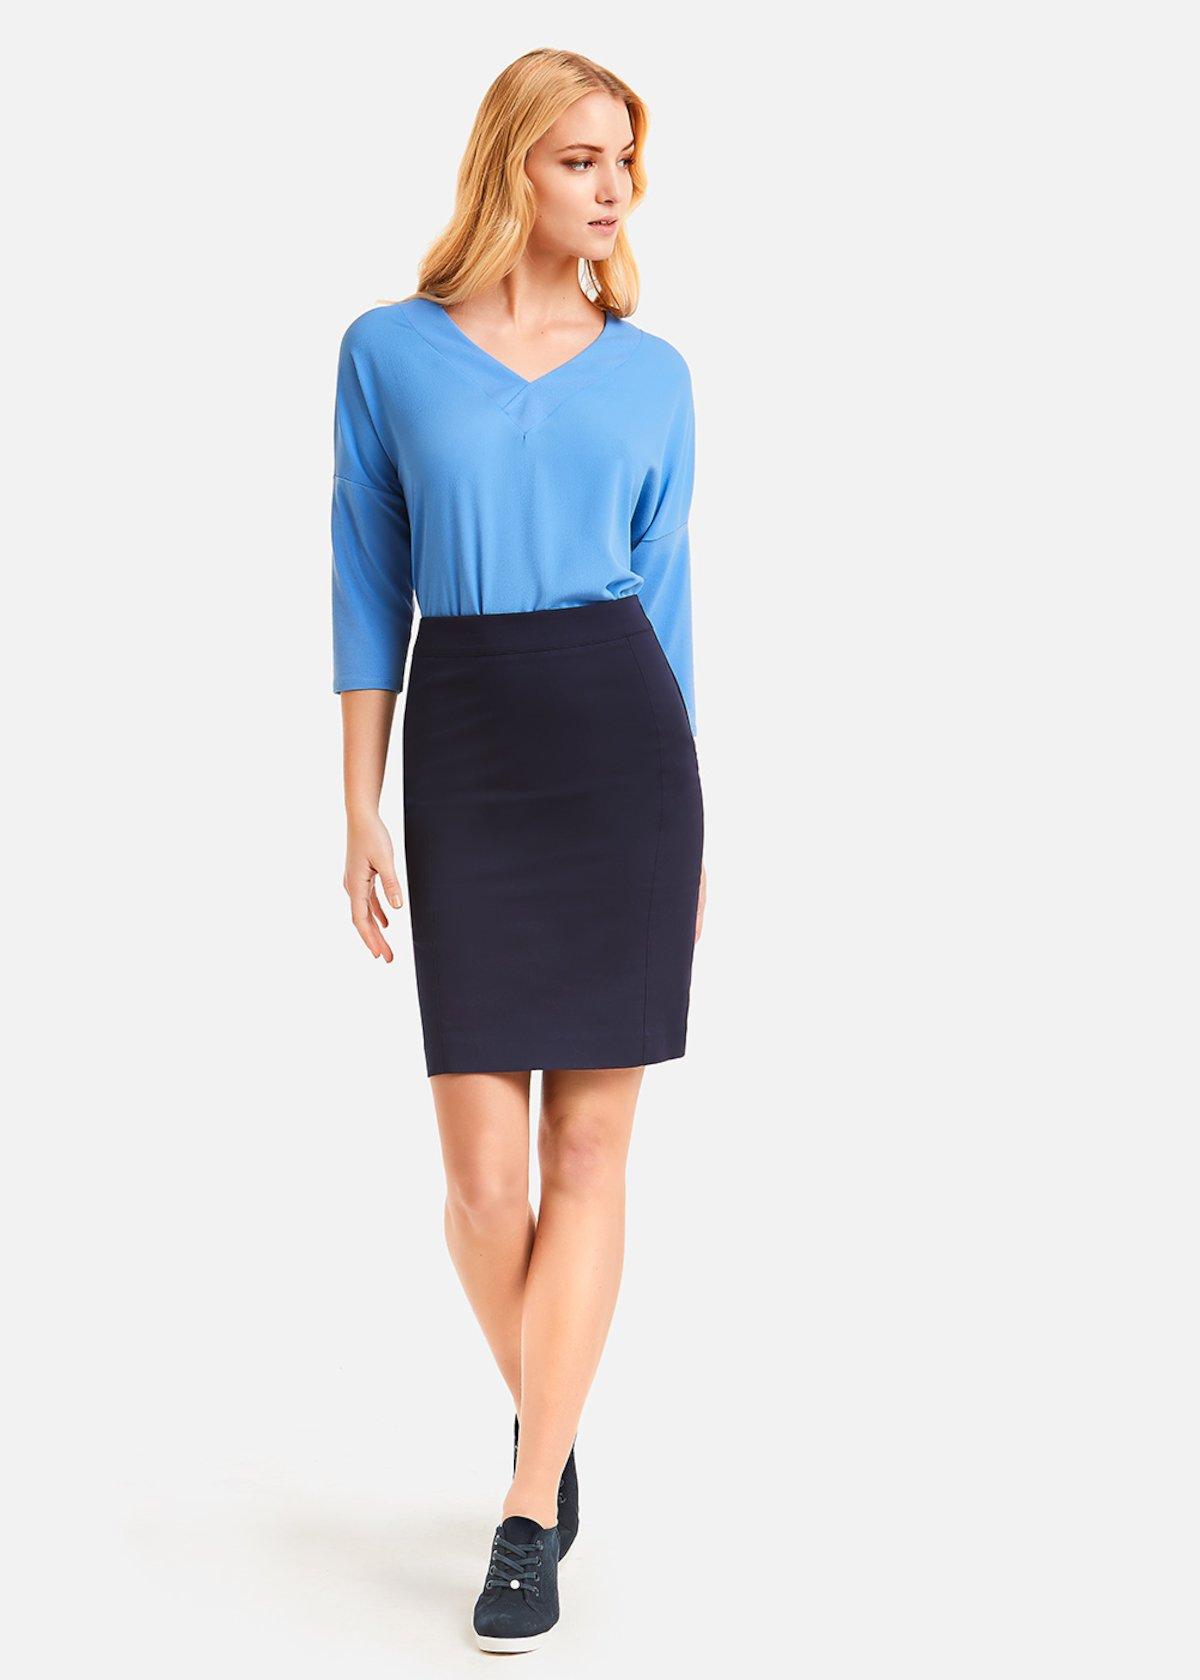 Gloria skirt fabric jeggings - Medium Blue